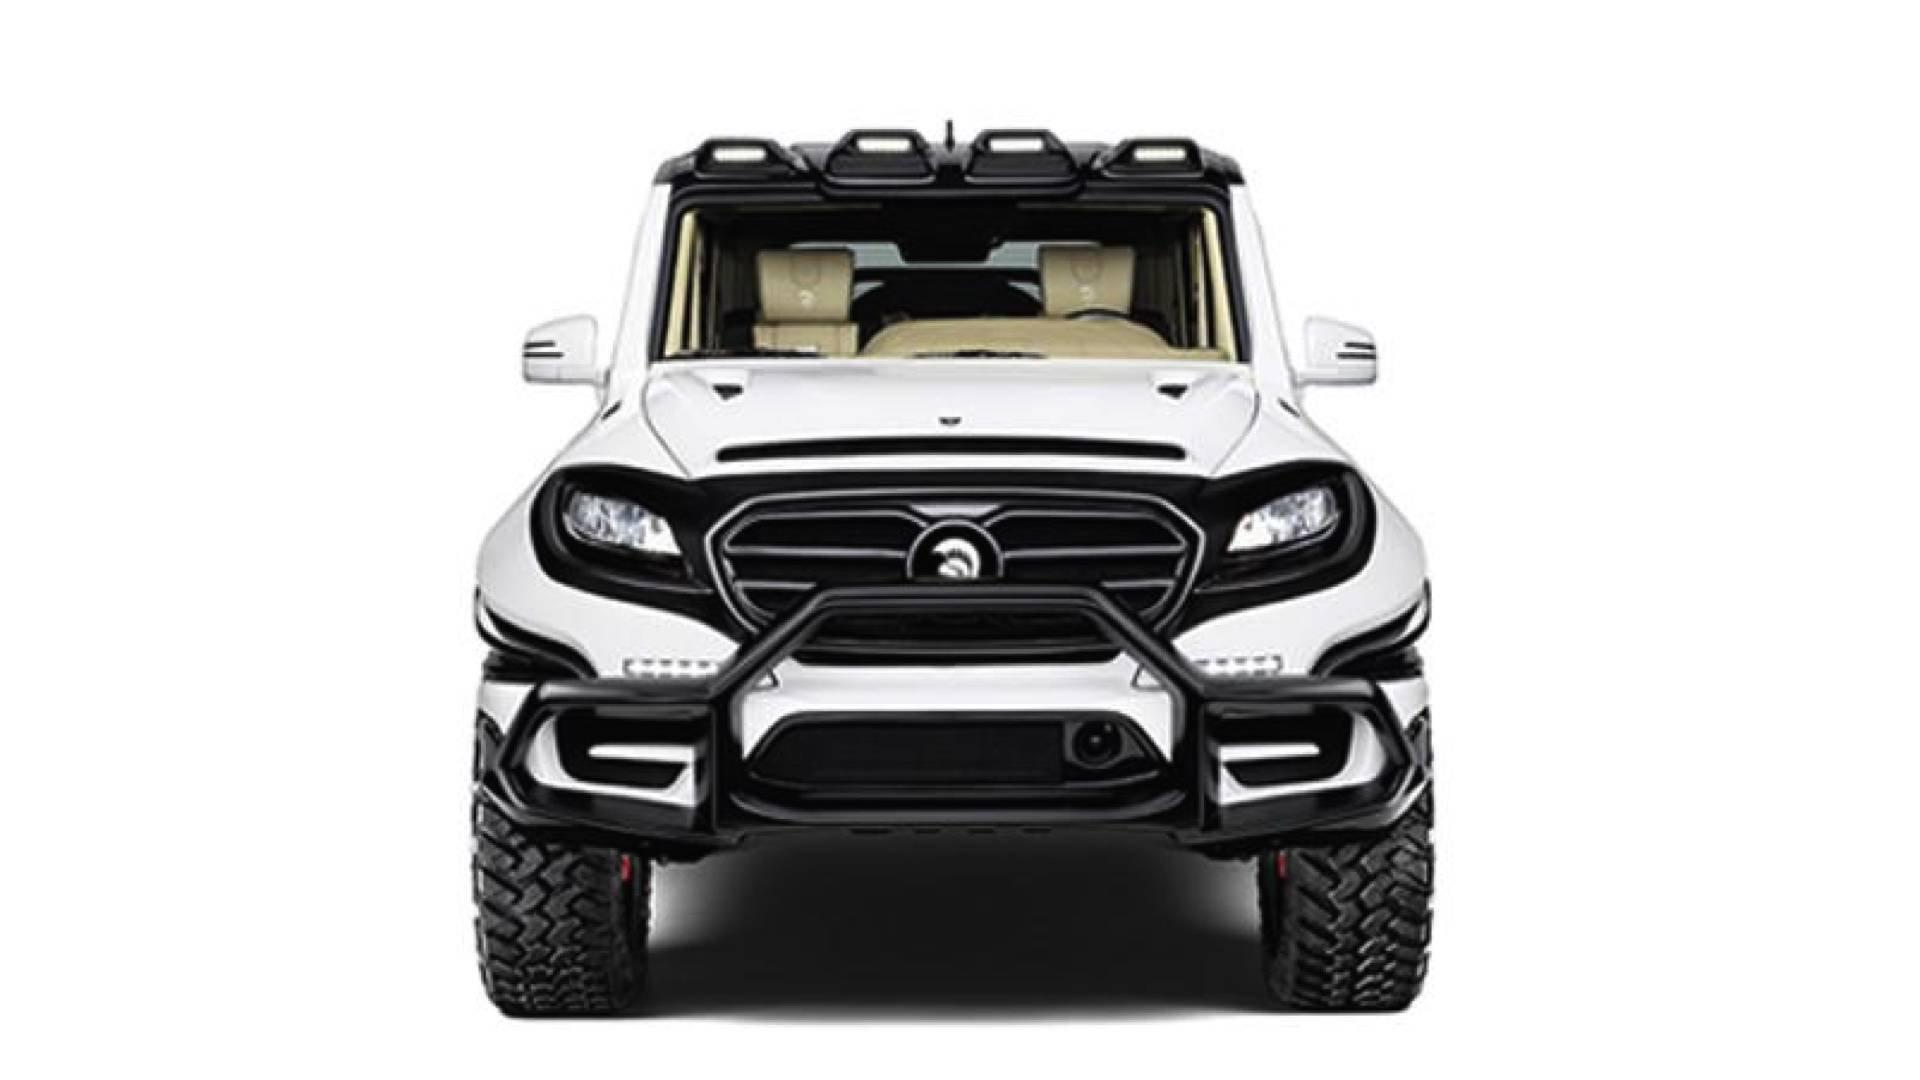 Обои внедорожник, 600 supercharged, ares design, range rover. Автомобили foto 11